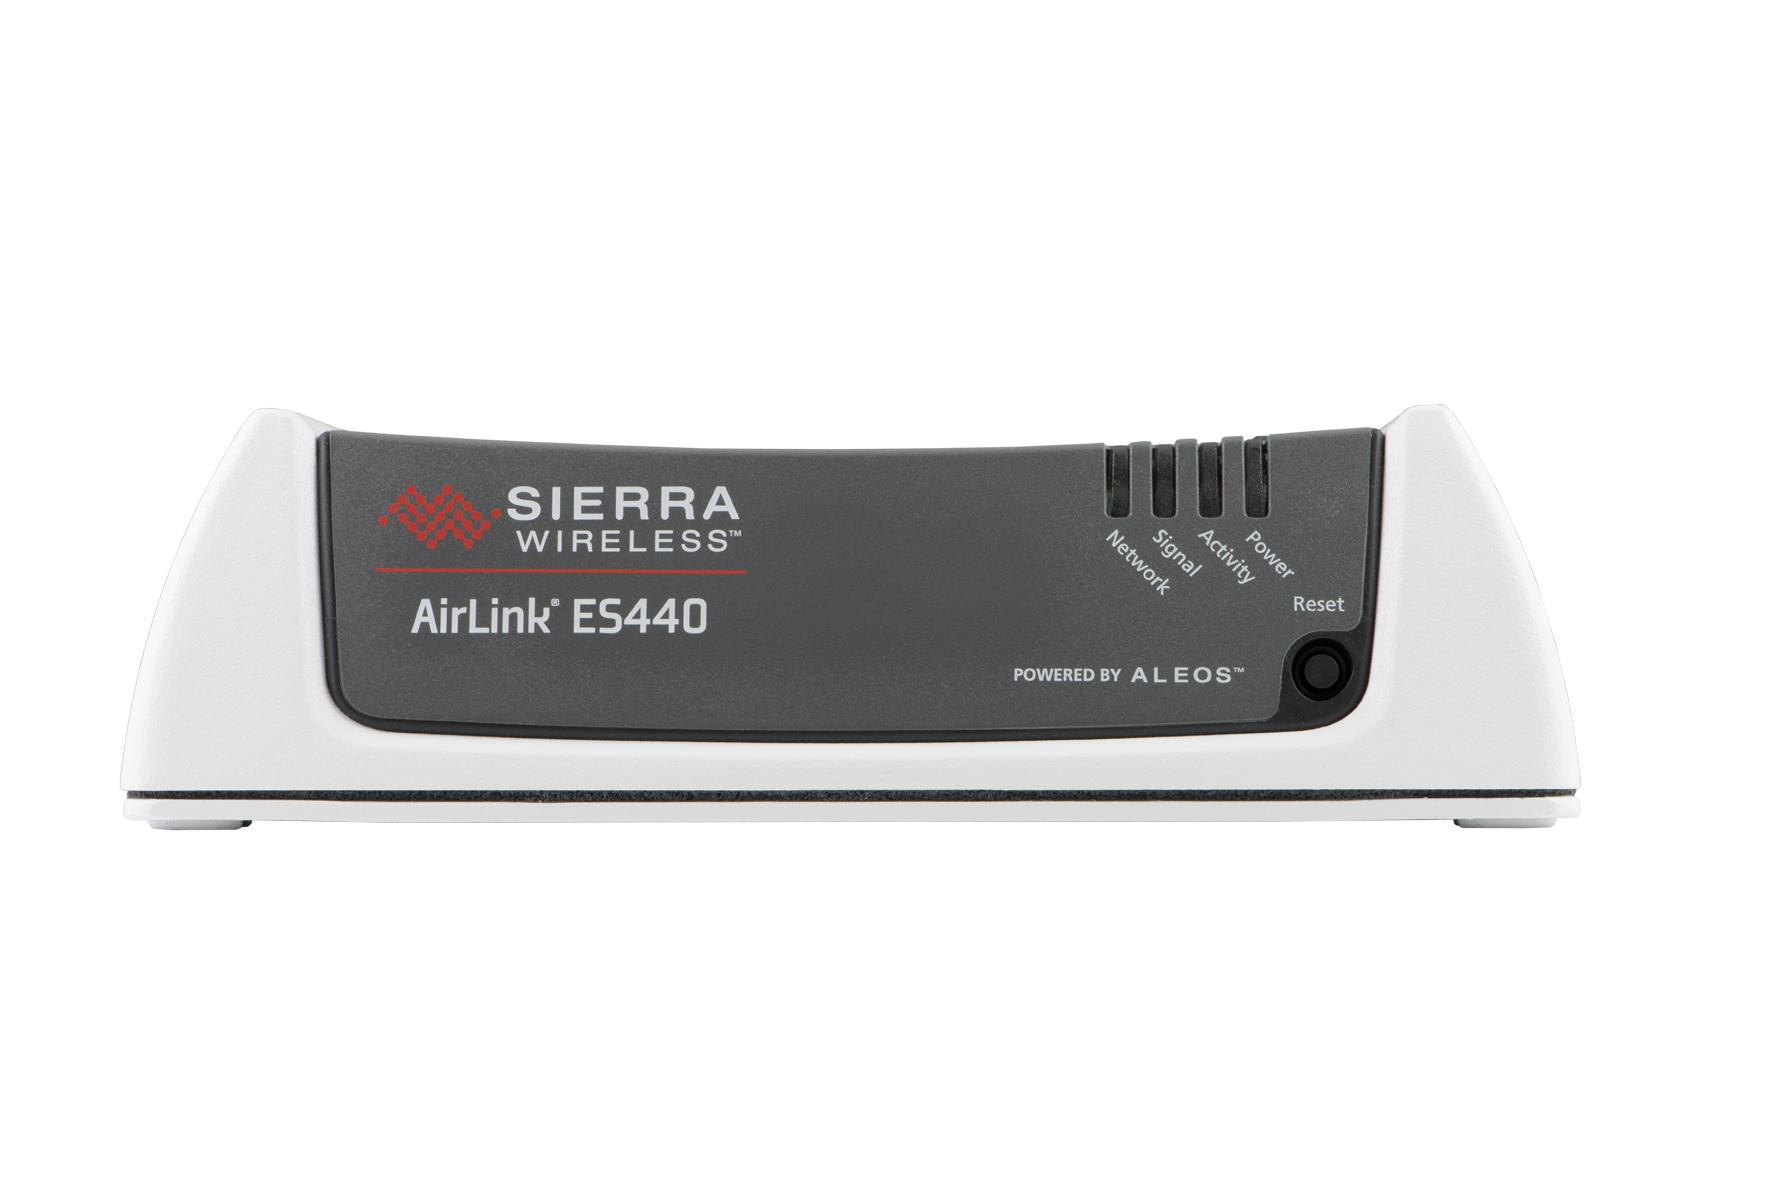 airlink es440 neuer lte umts router im test netvodo. Black Bedroom Furniture Sets. Home Design Ideas